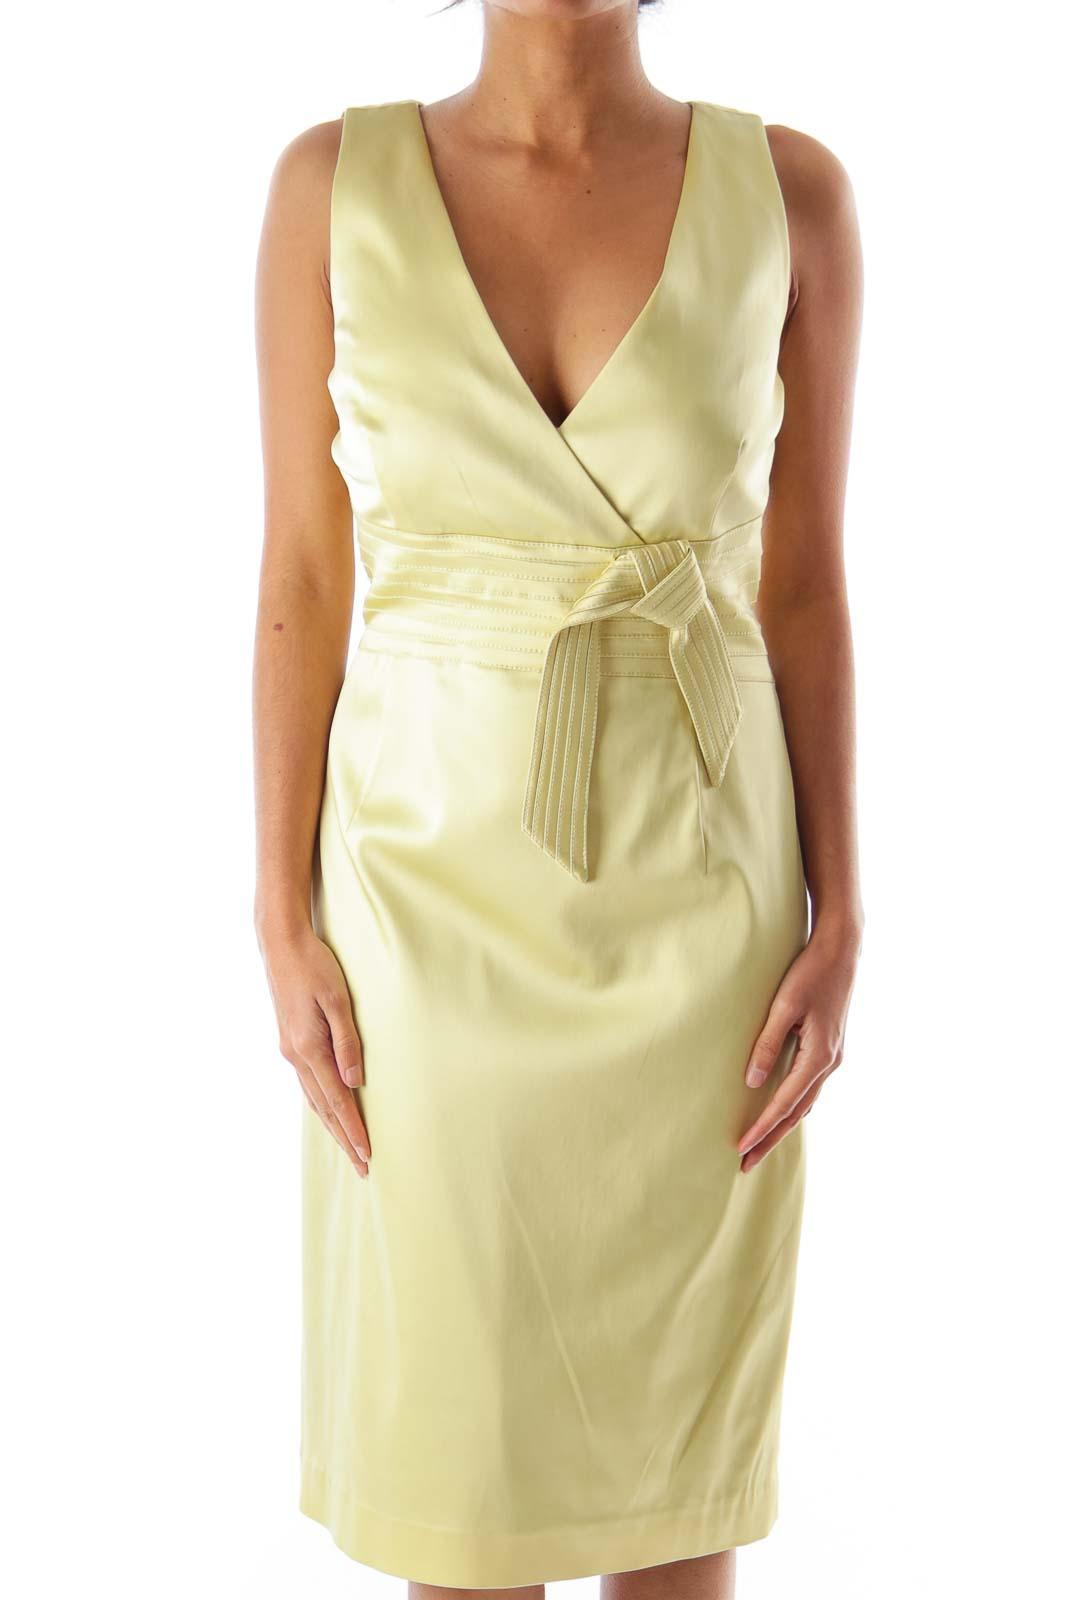 Pastel Green Bow Dress